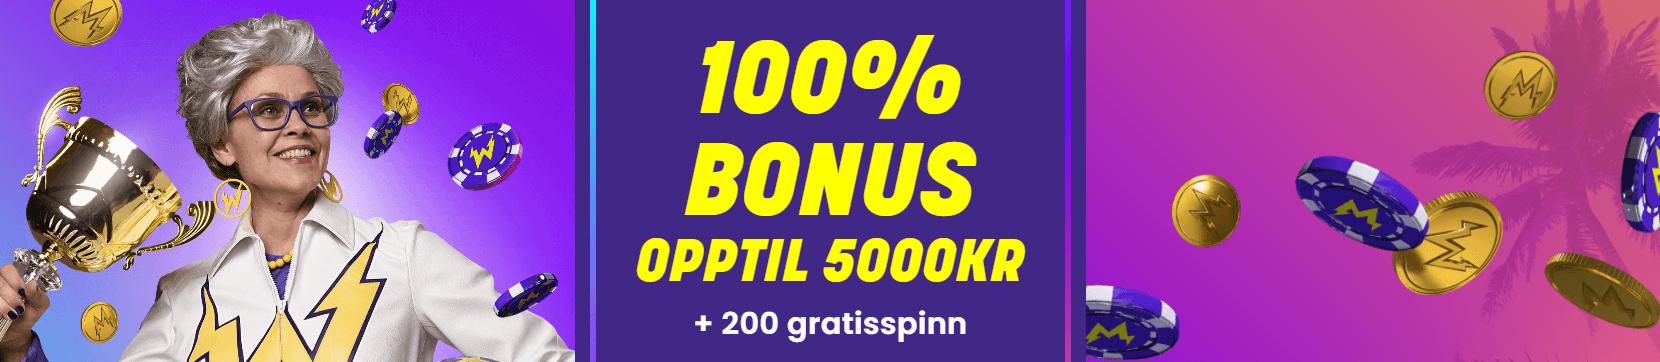 wildz NO 100% bonus opptil 5000 kr + 200 free spins